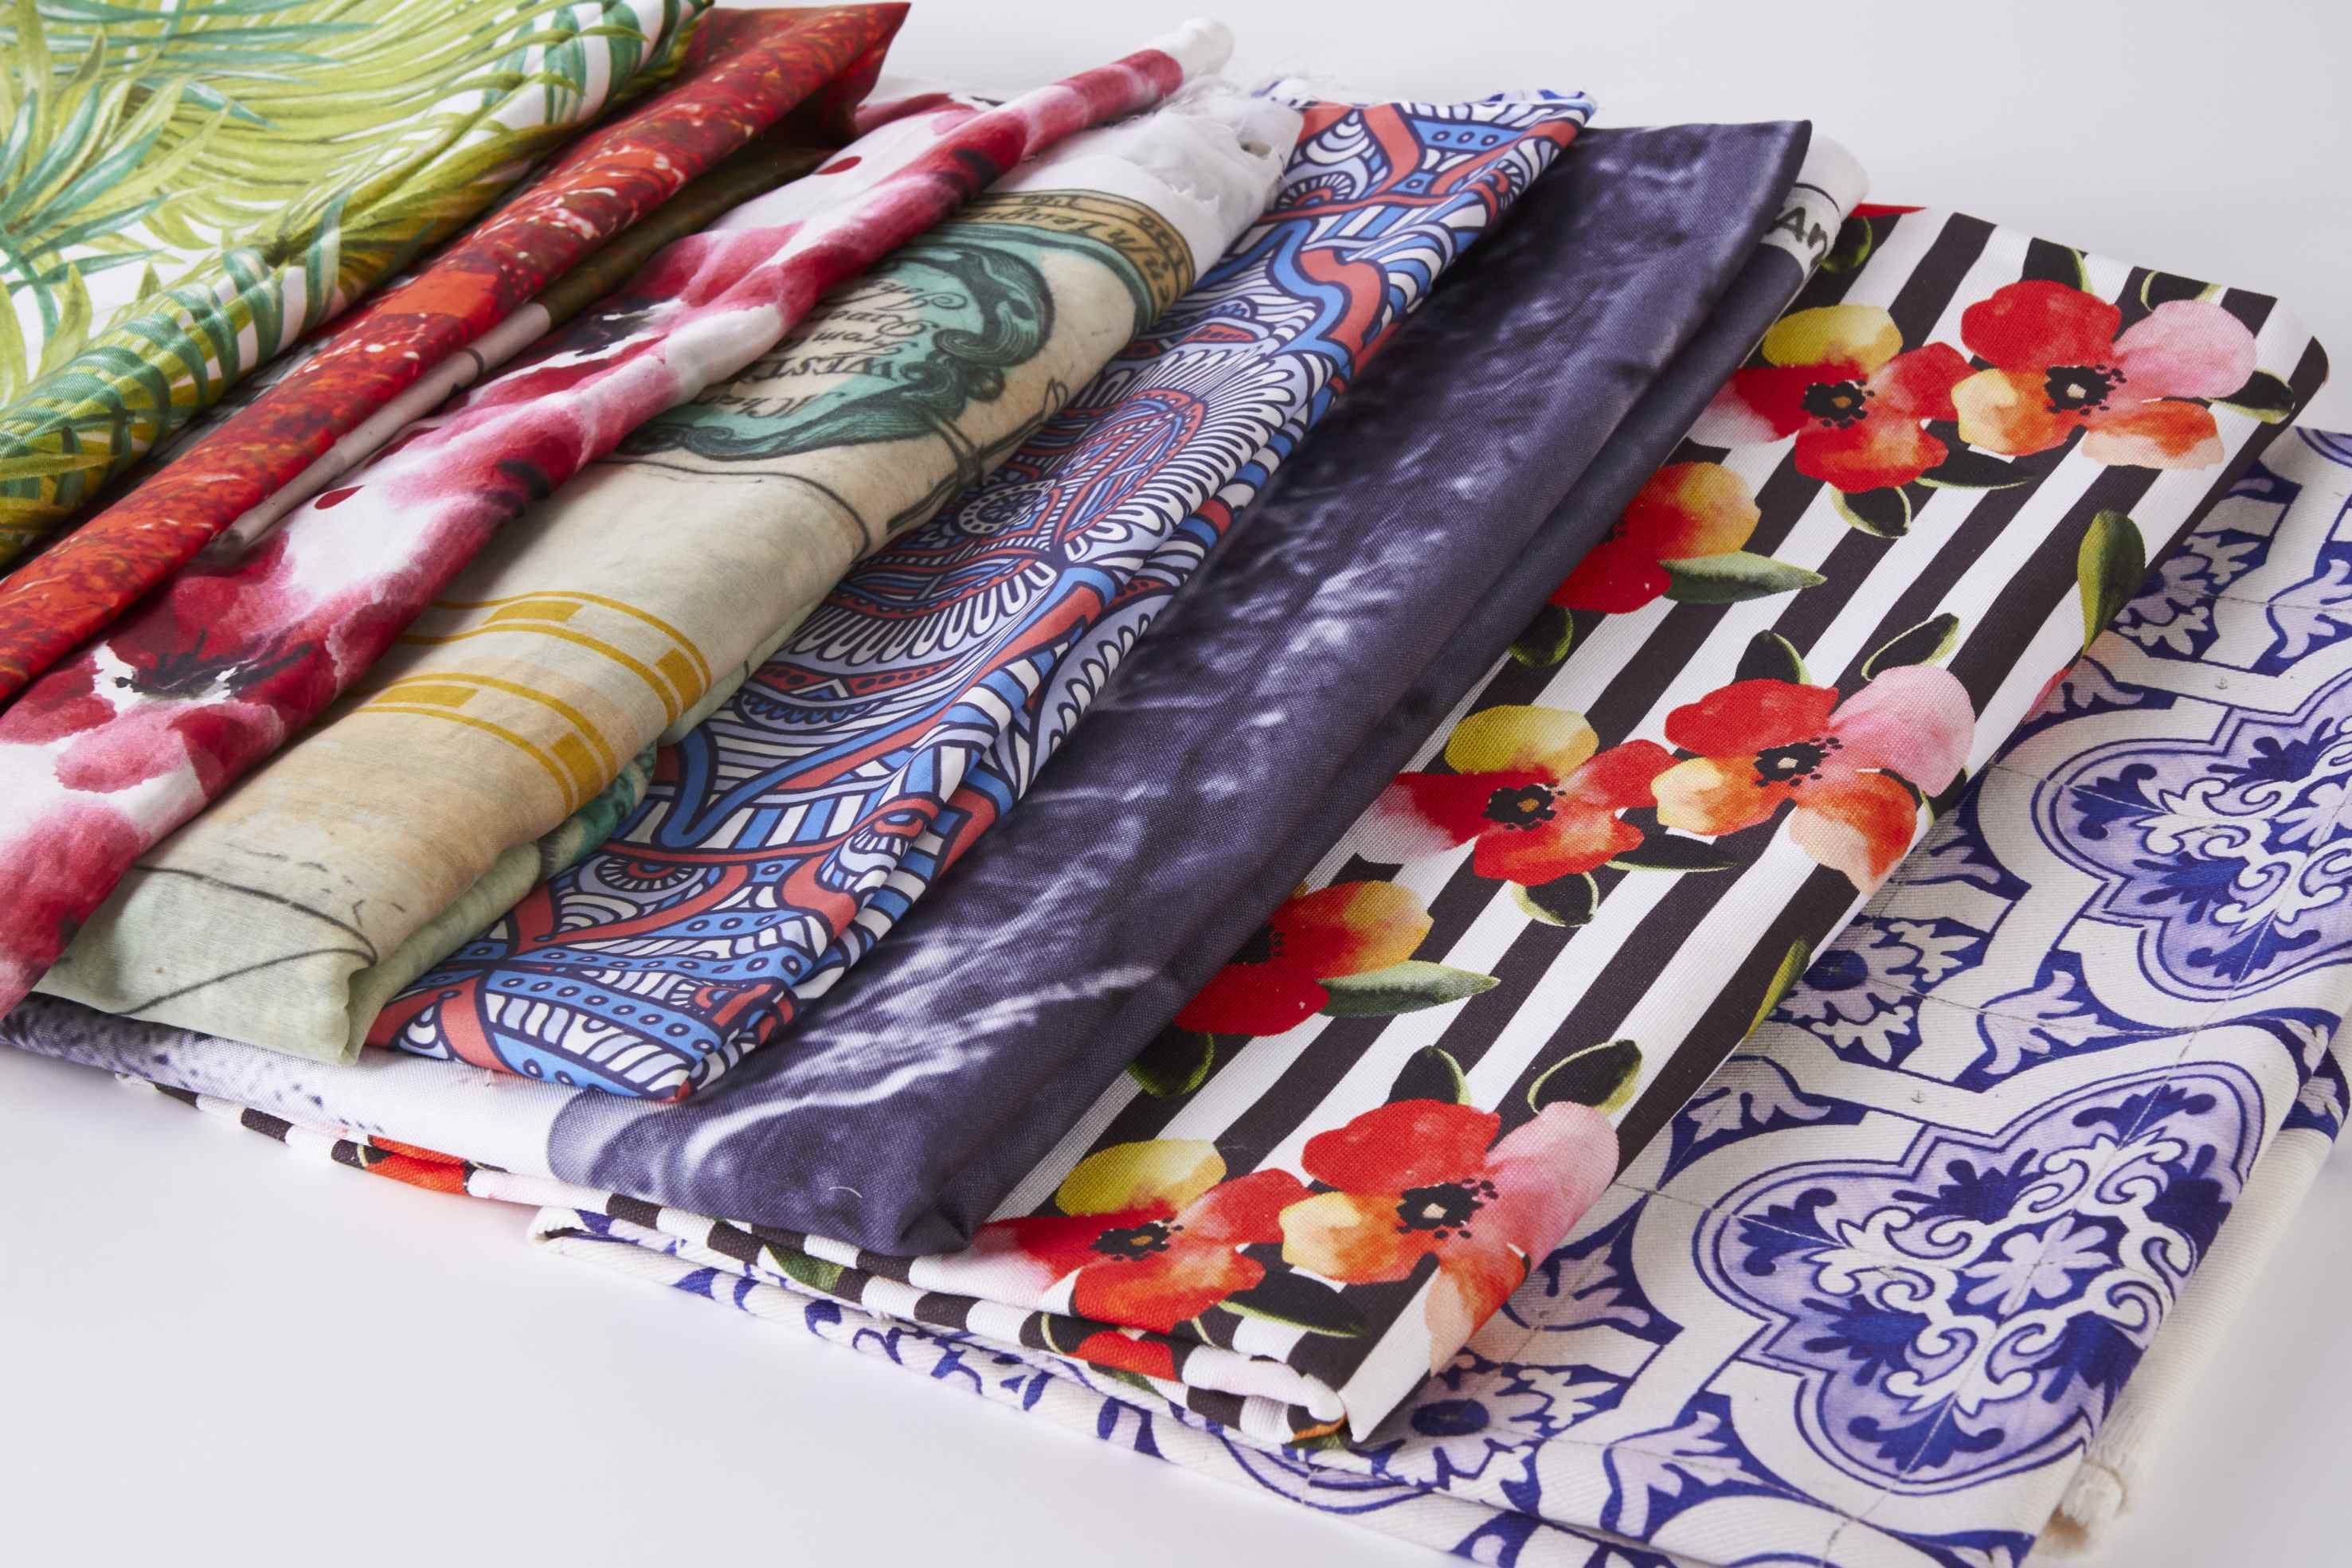 Pixartprinting entra nel mercato del tessile.